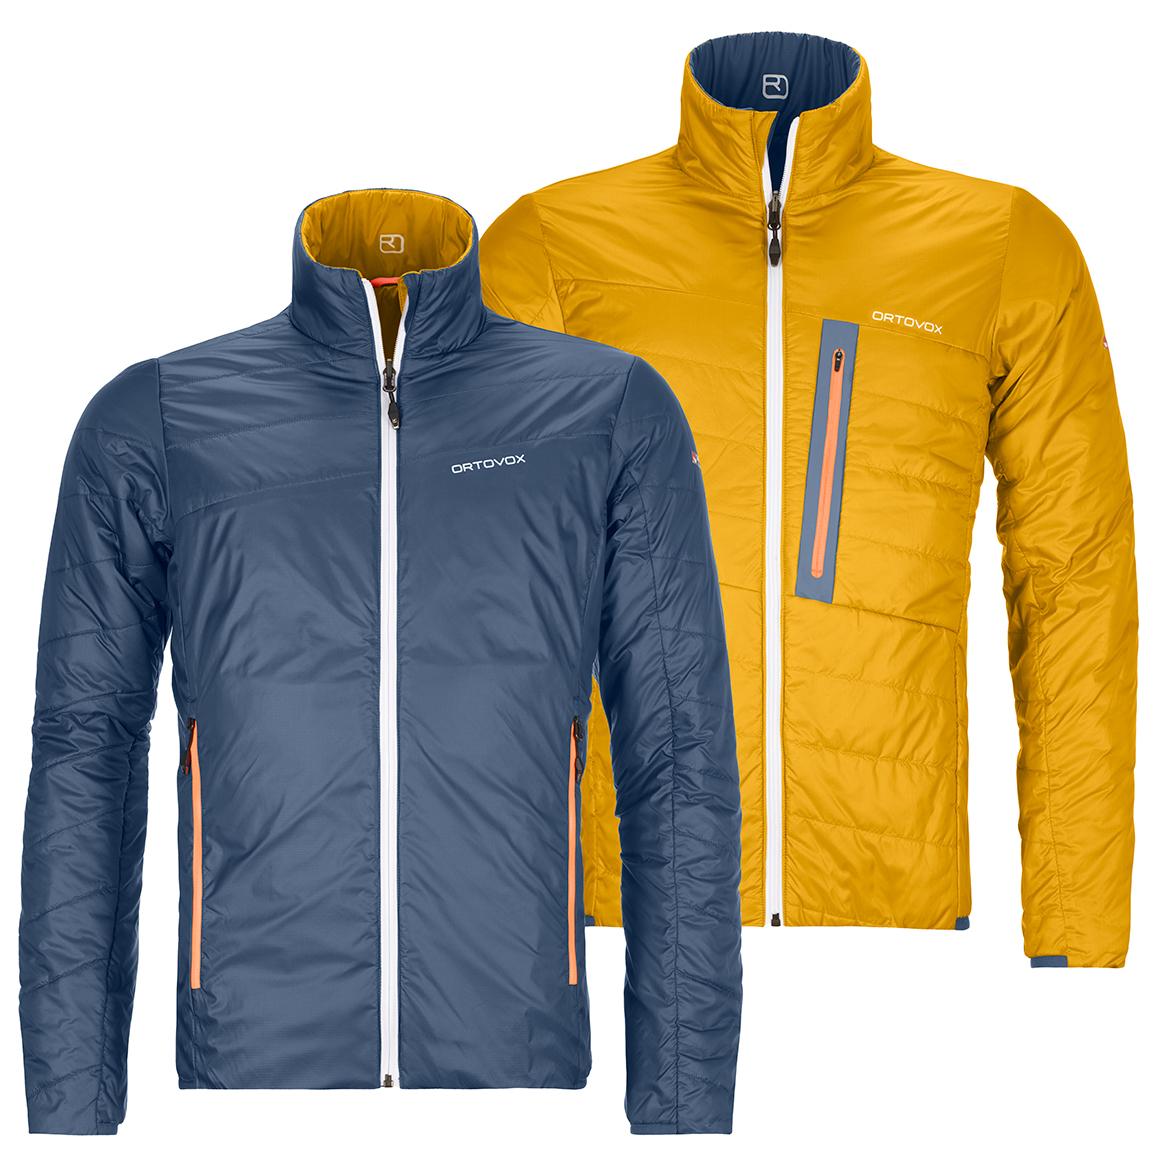 Ortovox Swisswool Piz Boval Jacket Wolljacke Herren